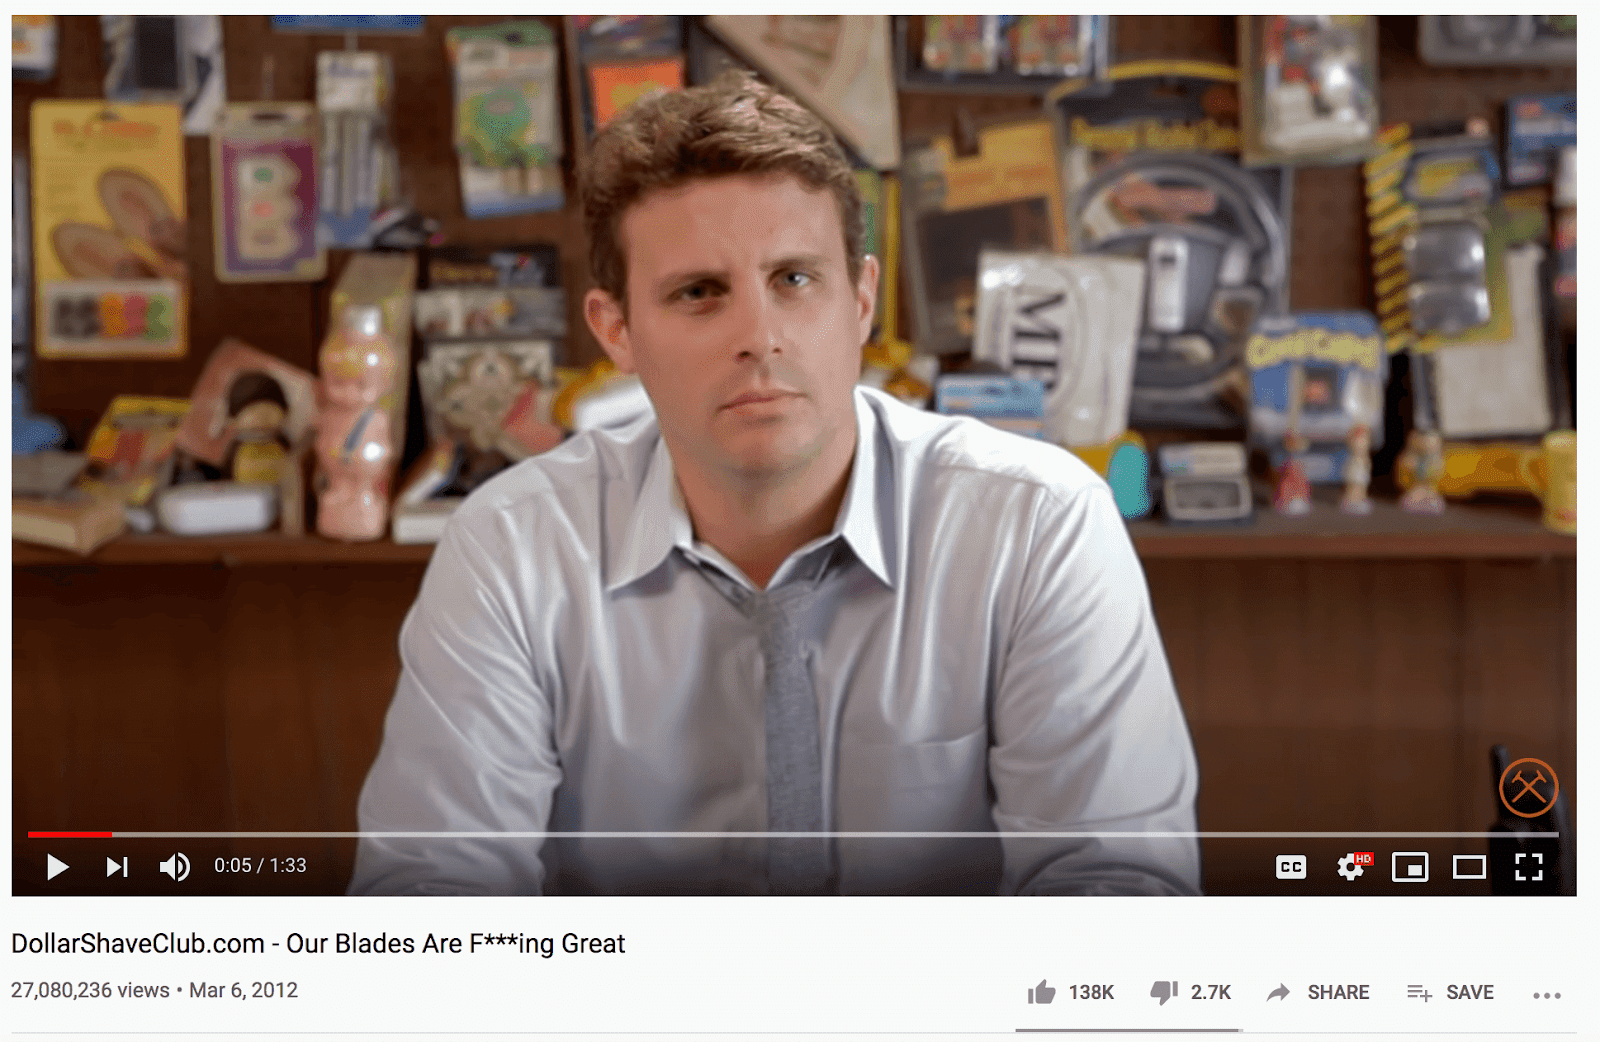 DollarShaveClub youtube video